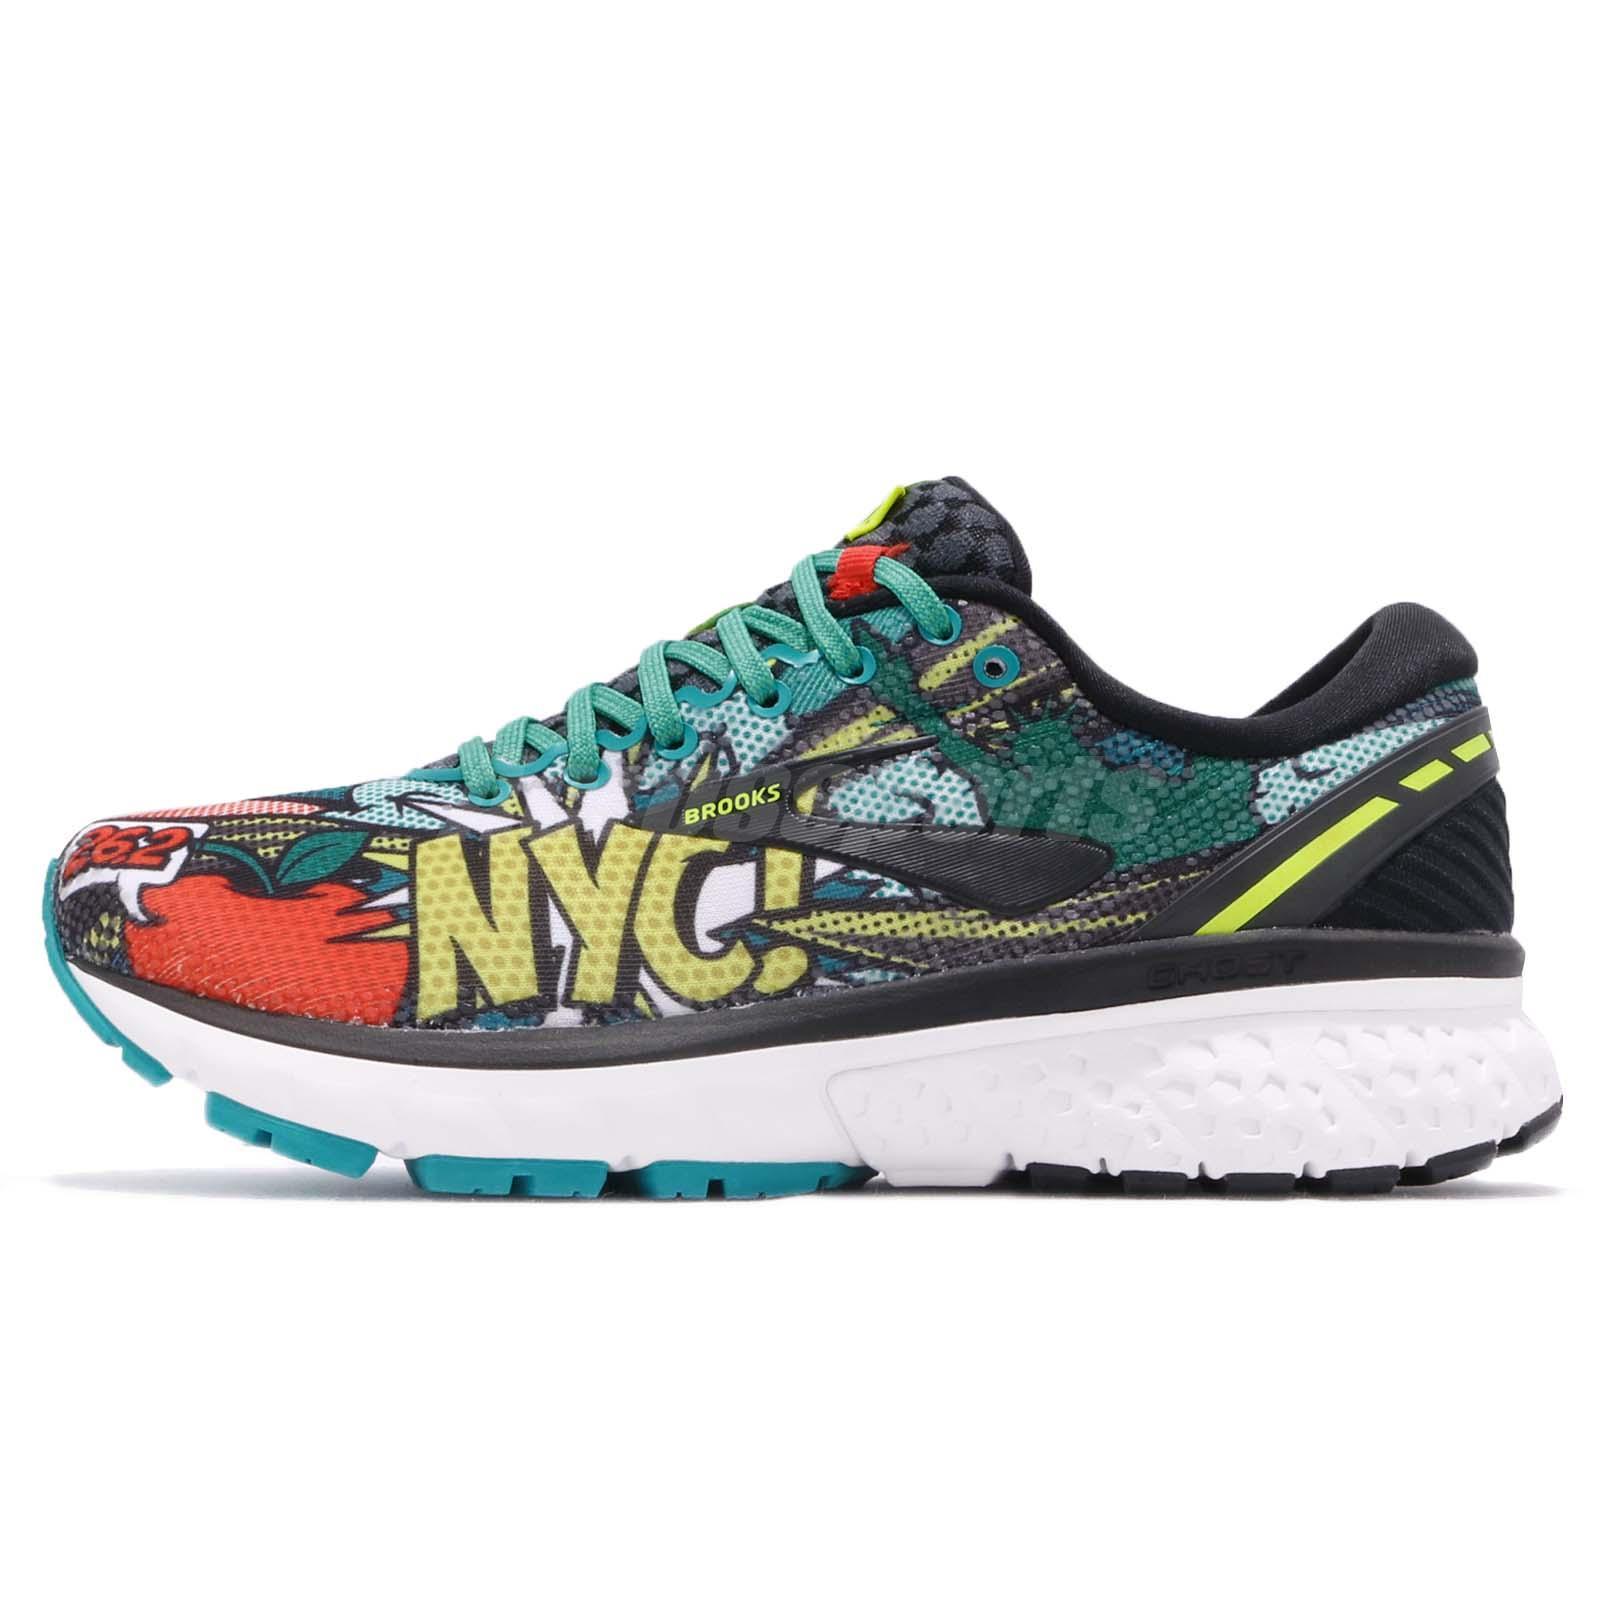 e0219150566 Brooks Ghost 11 New York Marathon Black Pop Art Women Running Shoes 120277  1B